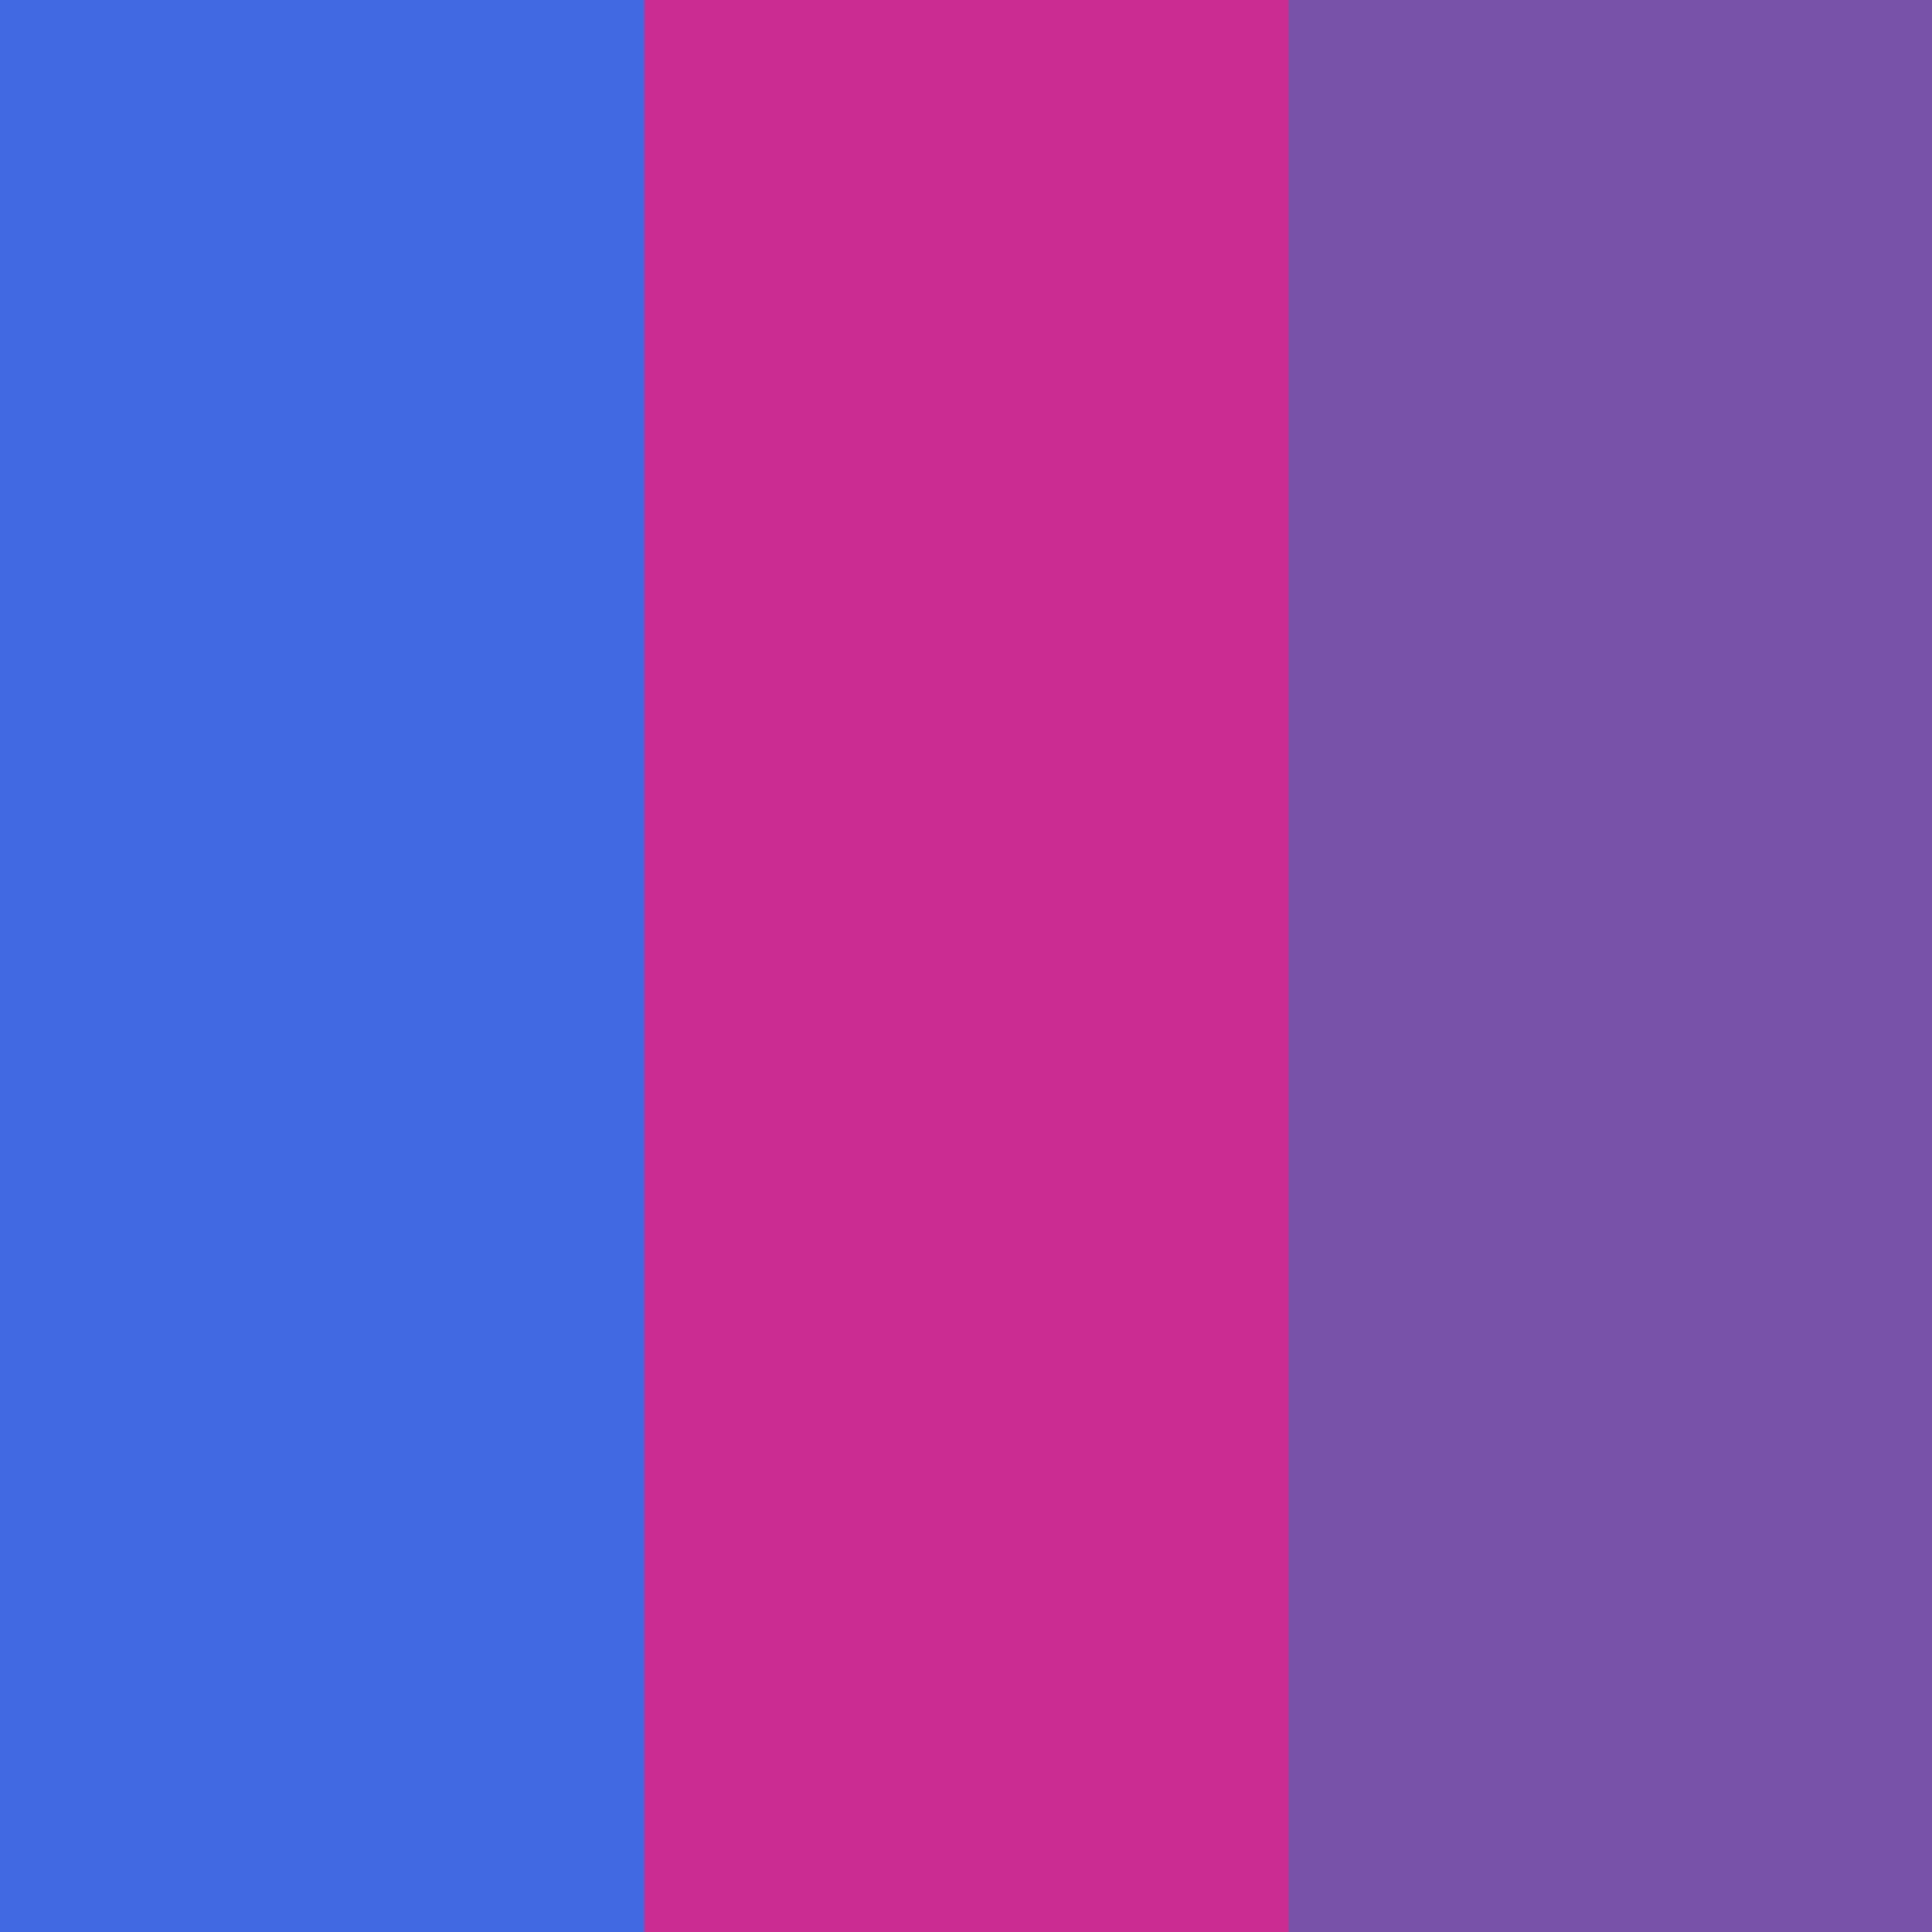 Royal Purple Background Royal blue web royal fuchsia and royal purple 2048x2048